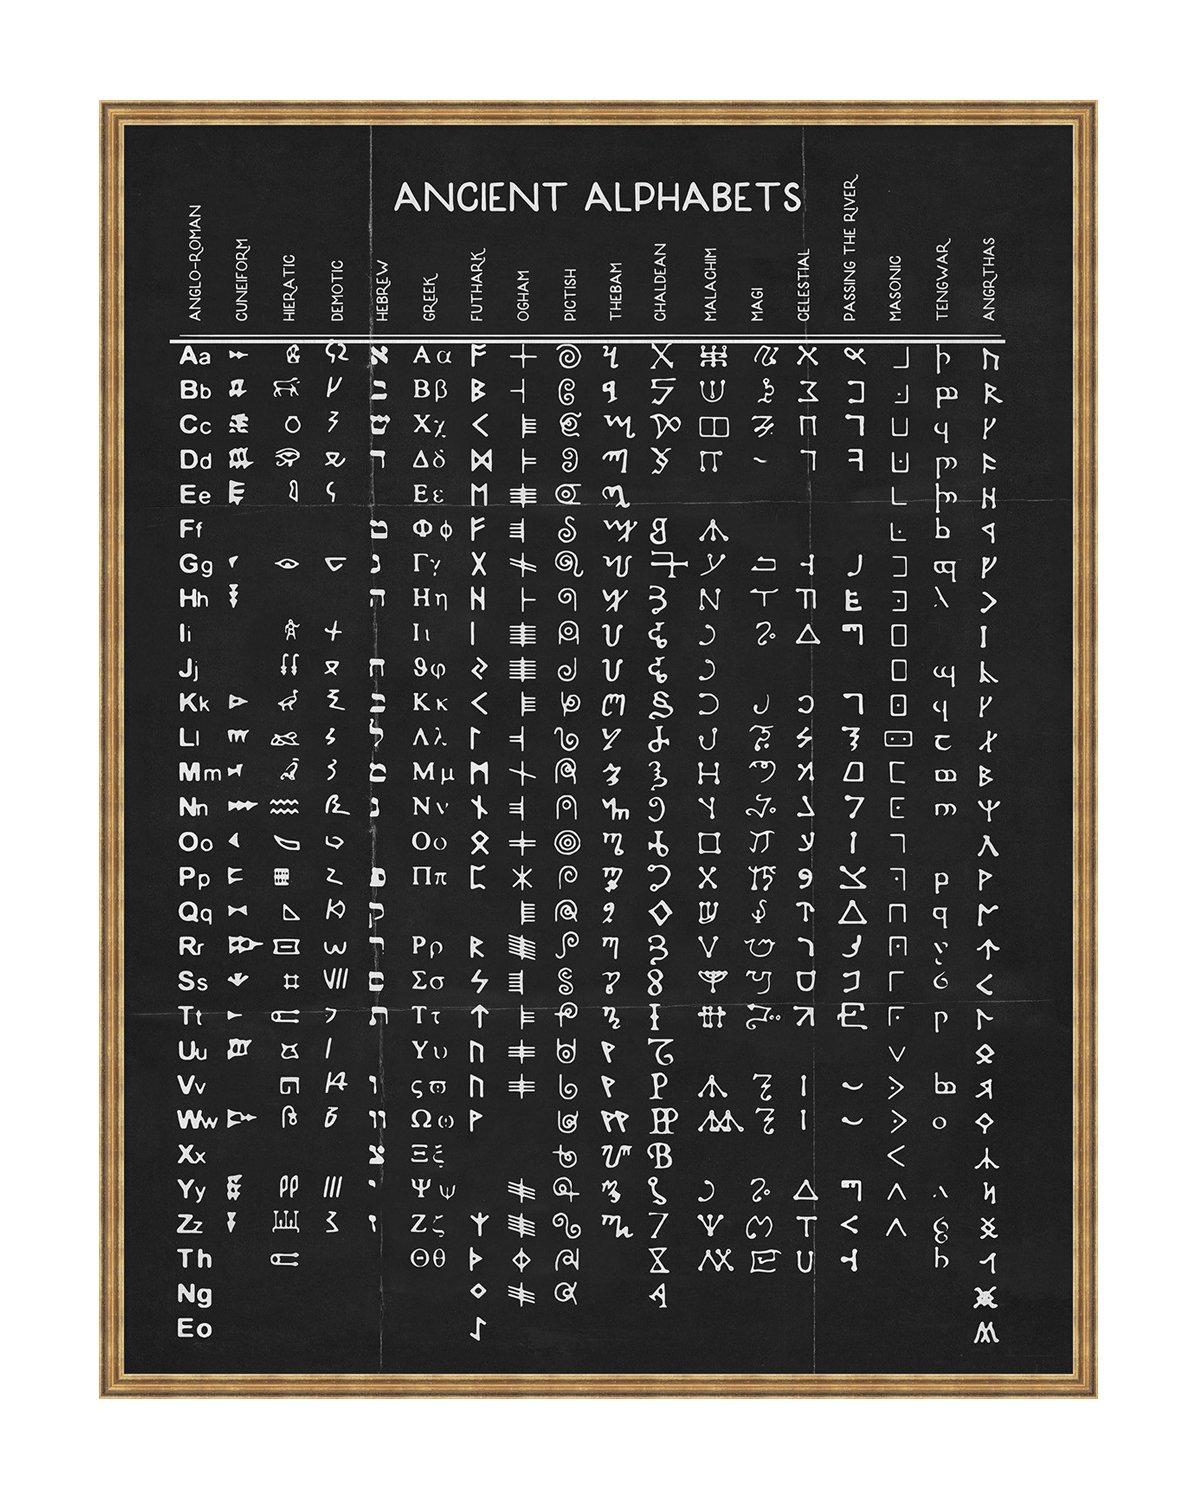 Ancient_Alphabets_1.jpg